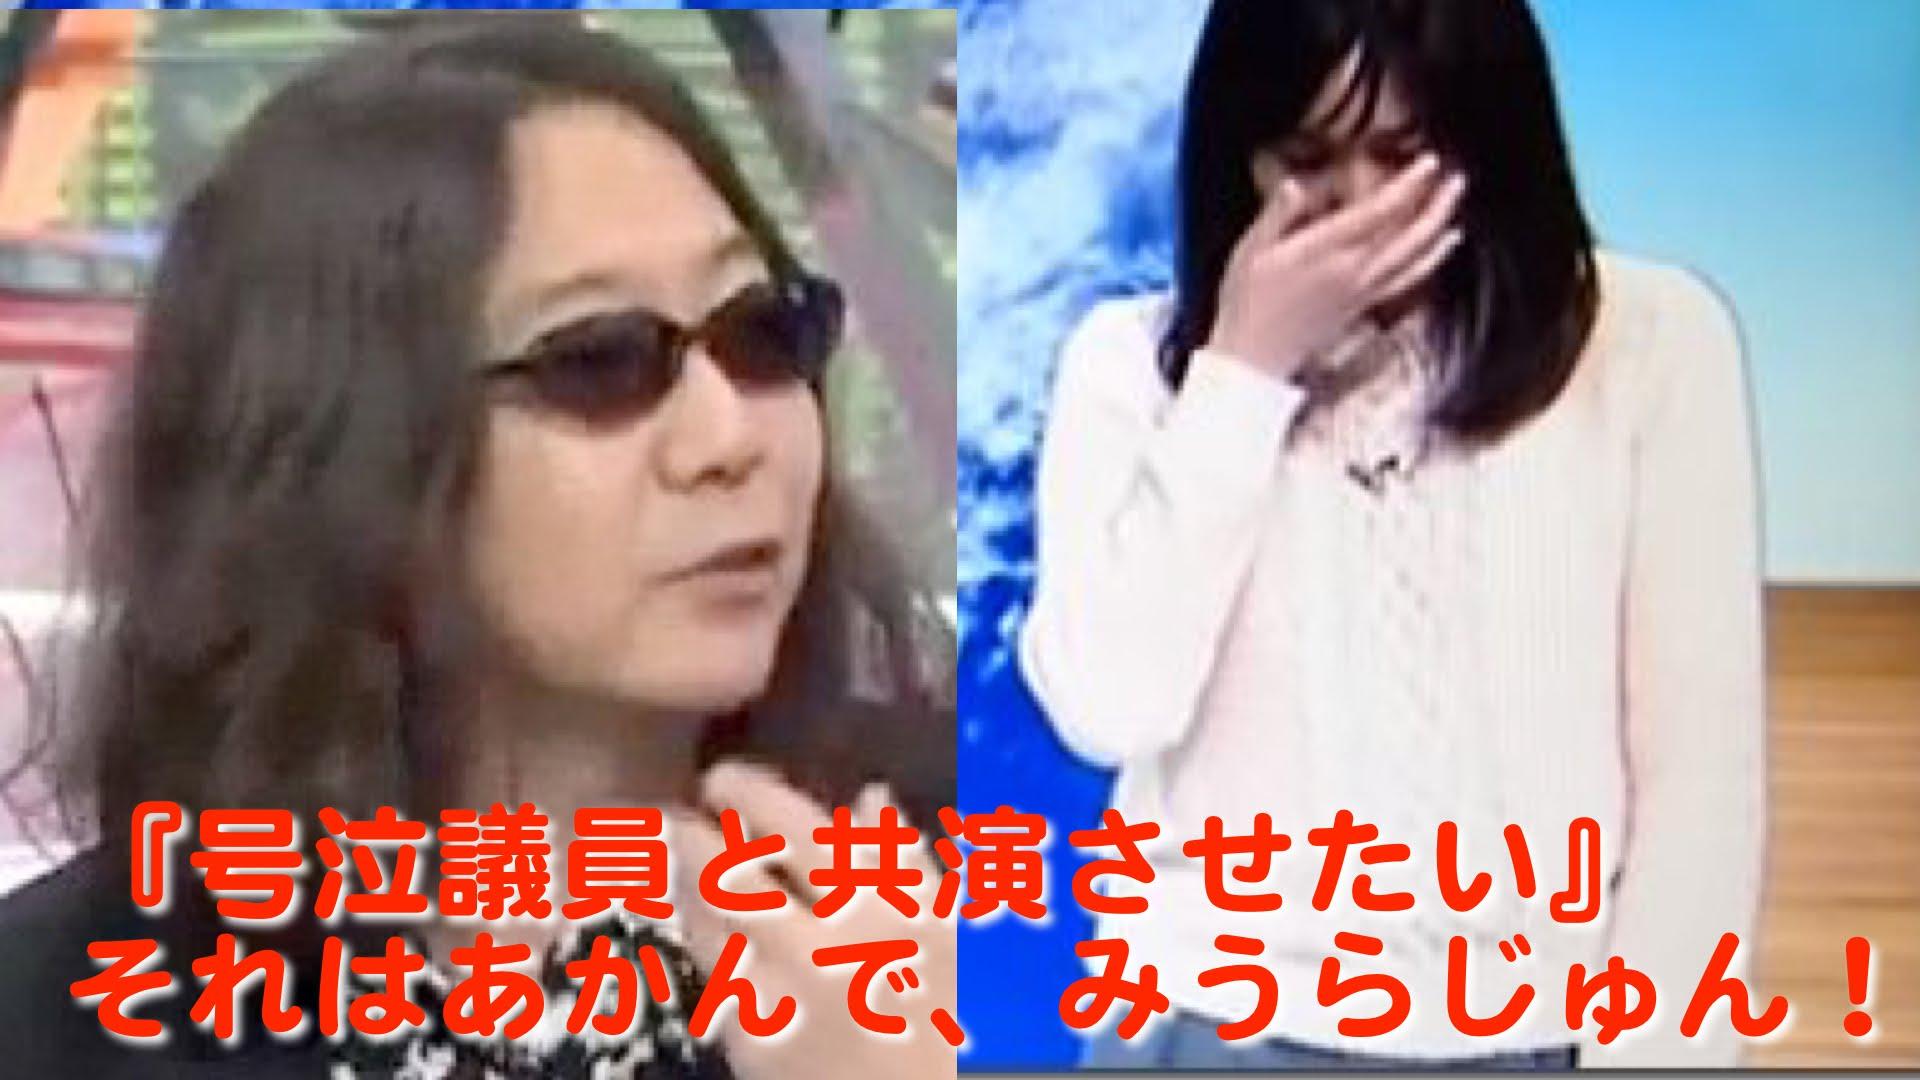 NHK山形・お天気おねえさん『号泣議員と共演させたい』みうらじゅんの発言は引くでw